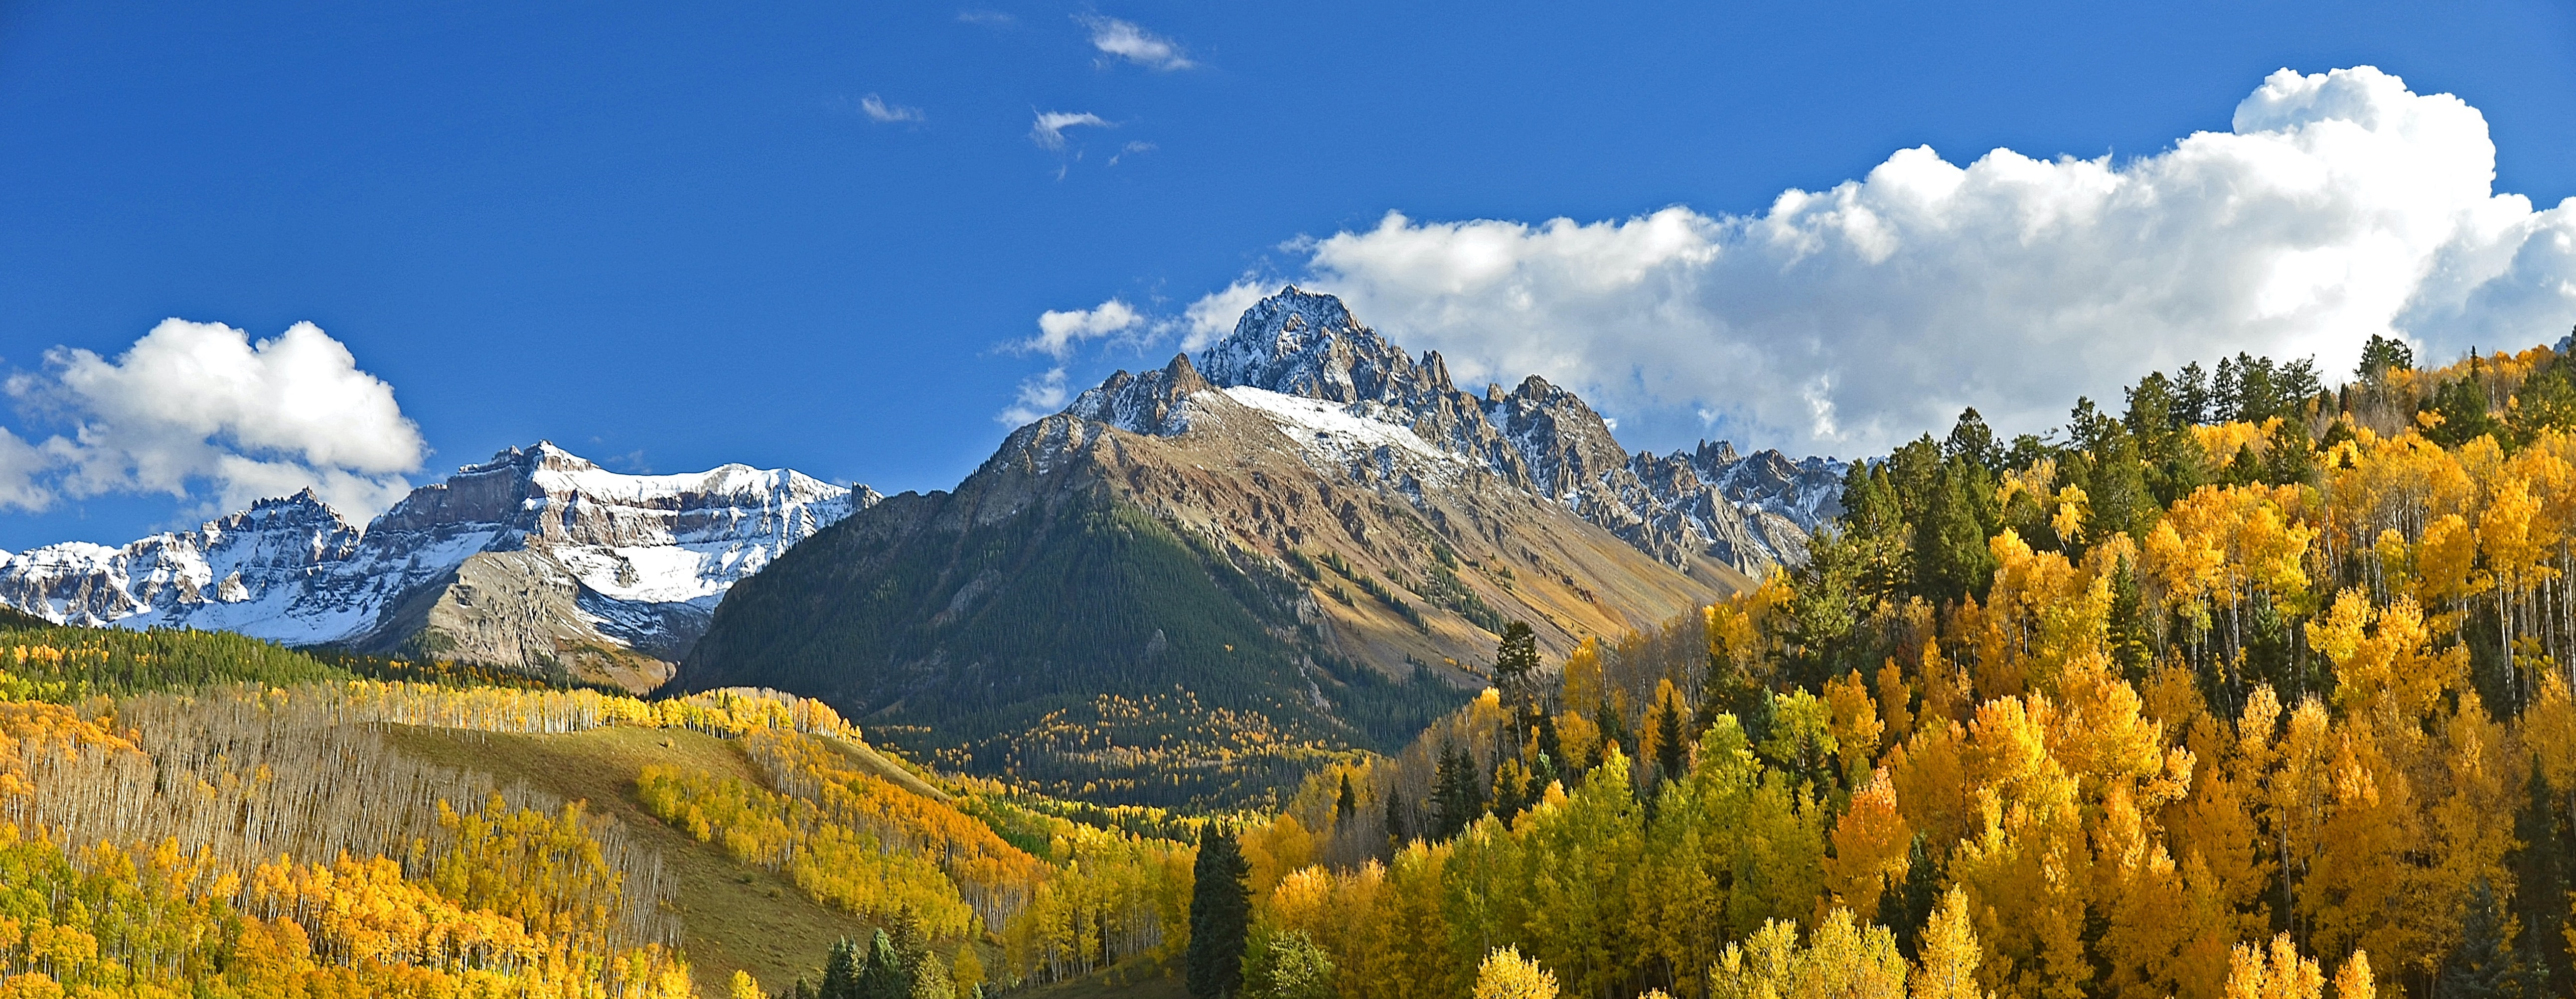 Rebecca Fassler Header Image Yellow Mountain